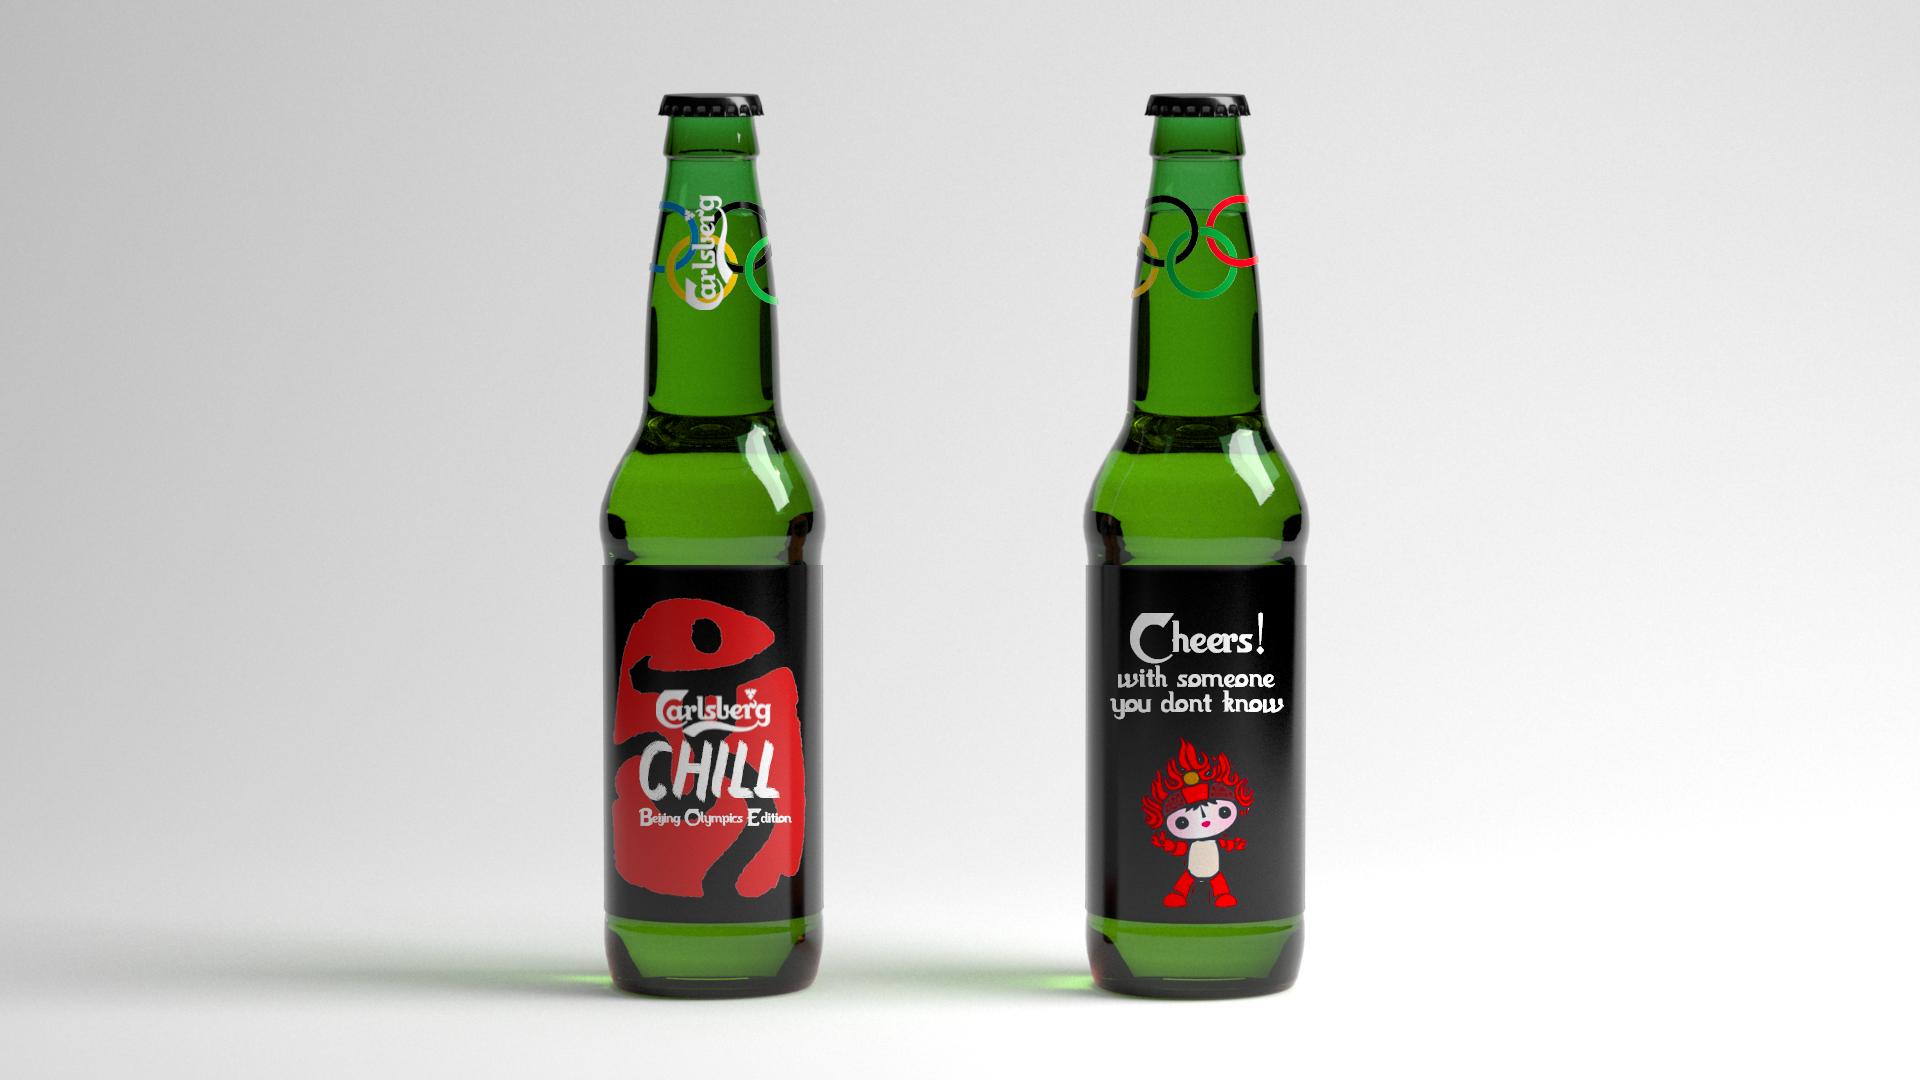 Beer_bottle_mockup_by_marcinjarka-cheer.png